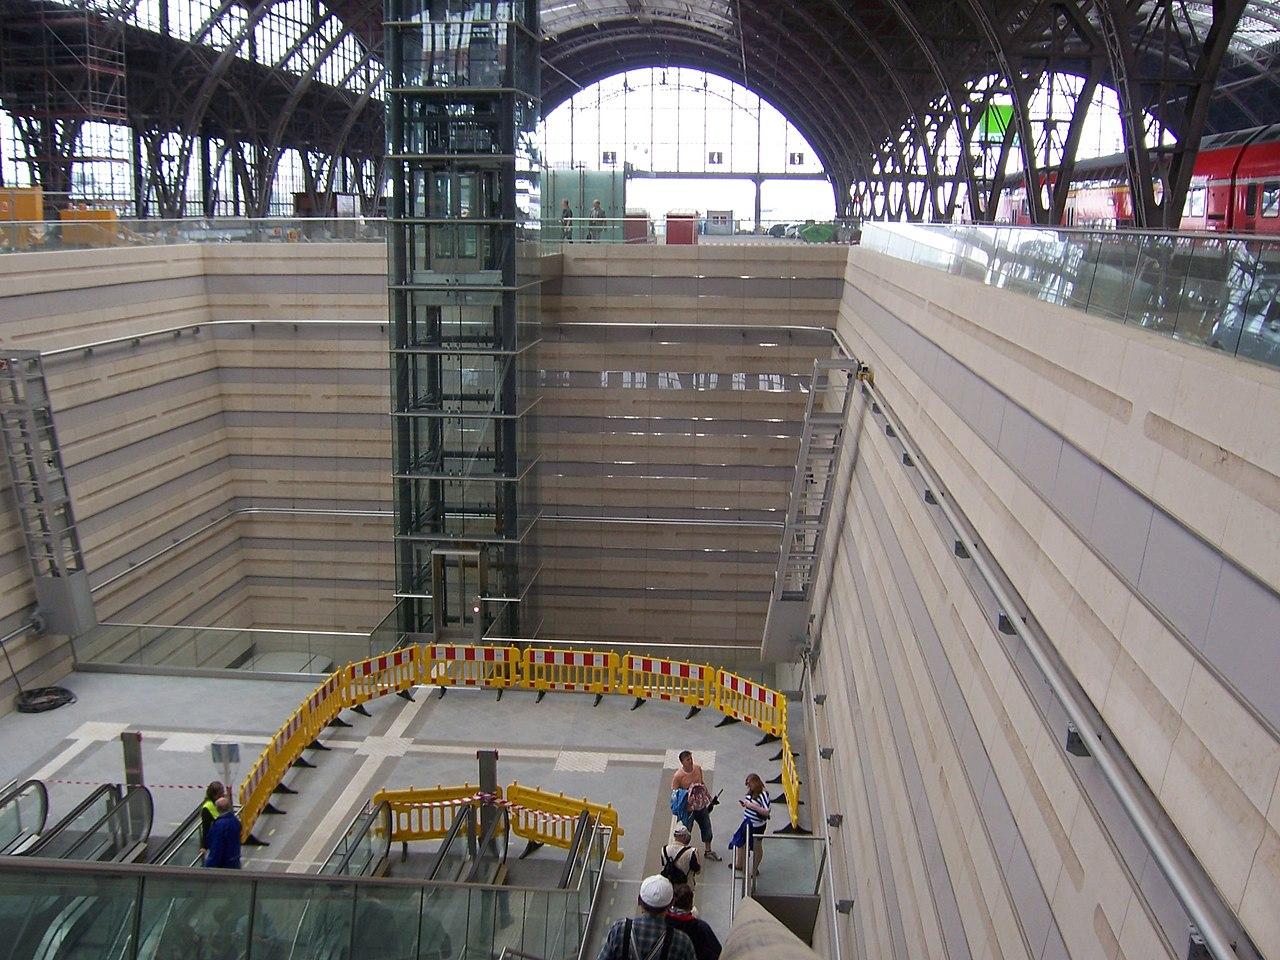 File:City-Tunnel Leipzig, Hauptbahnhof Atrium.JPG